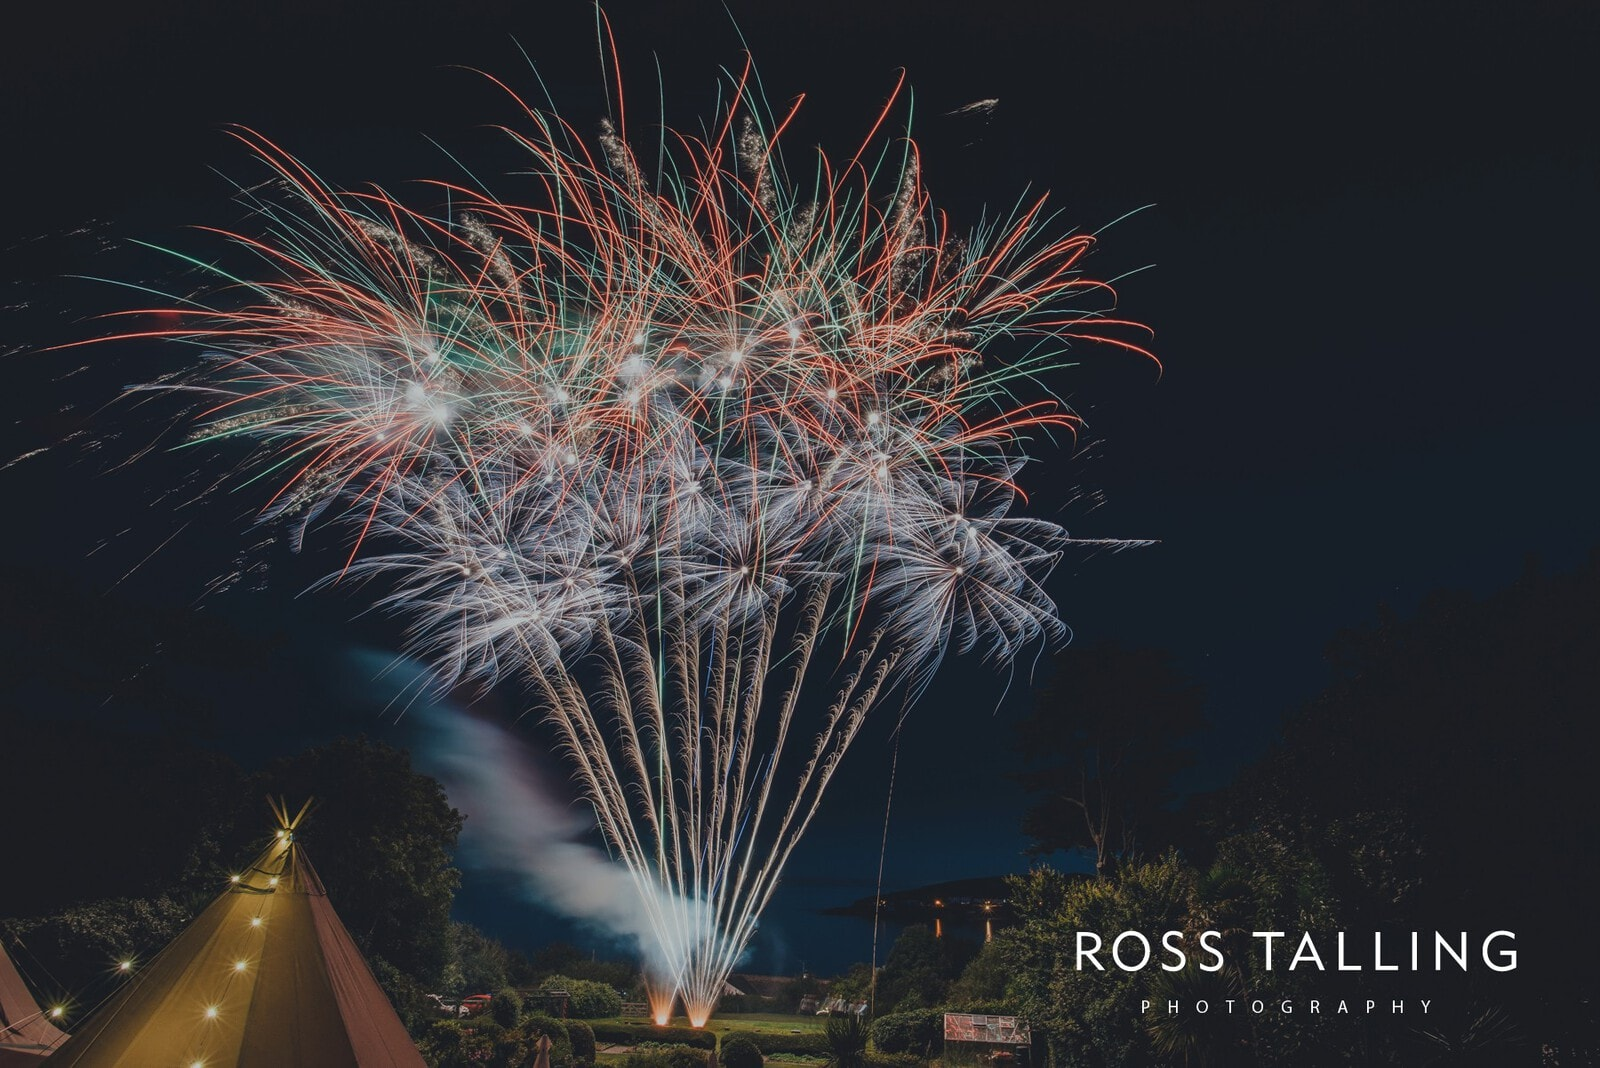 laura-matts-rosevine-hotel-wedding-photography-cornwall_0207